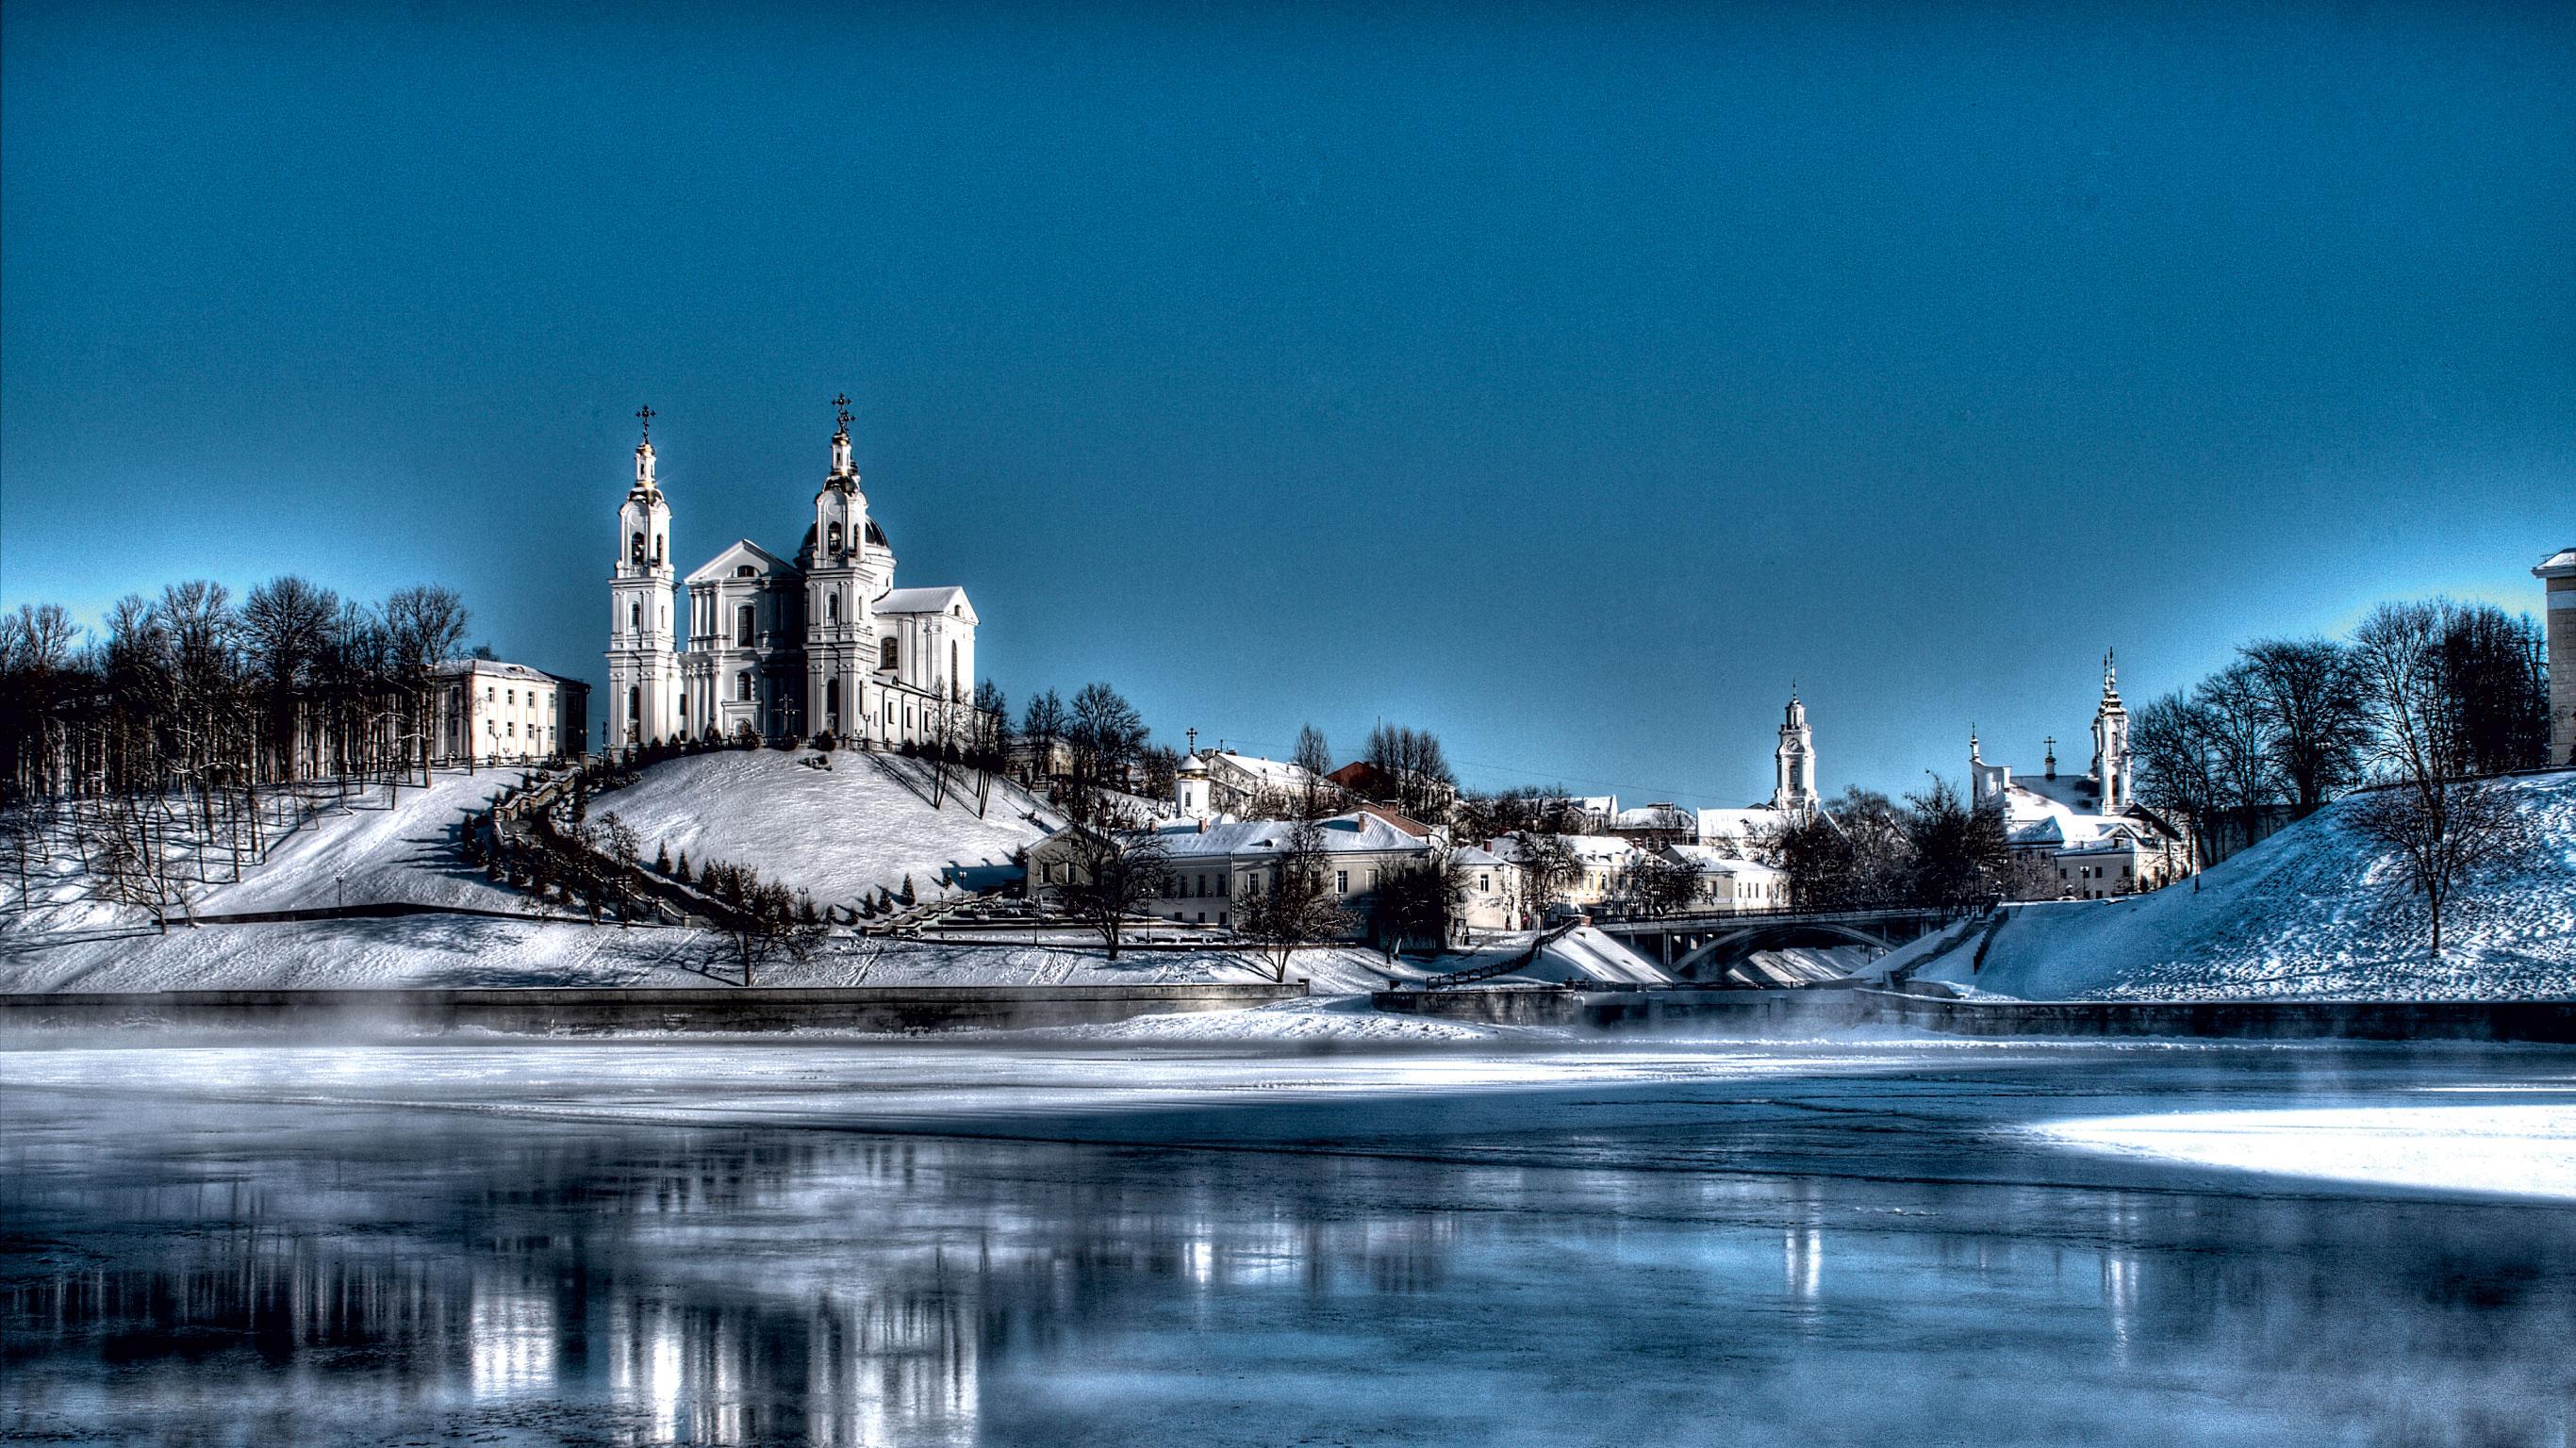 Беларусь зимой прекрасна